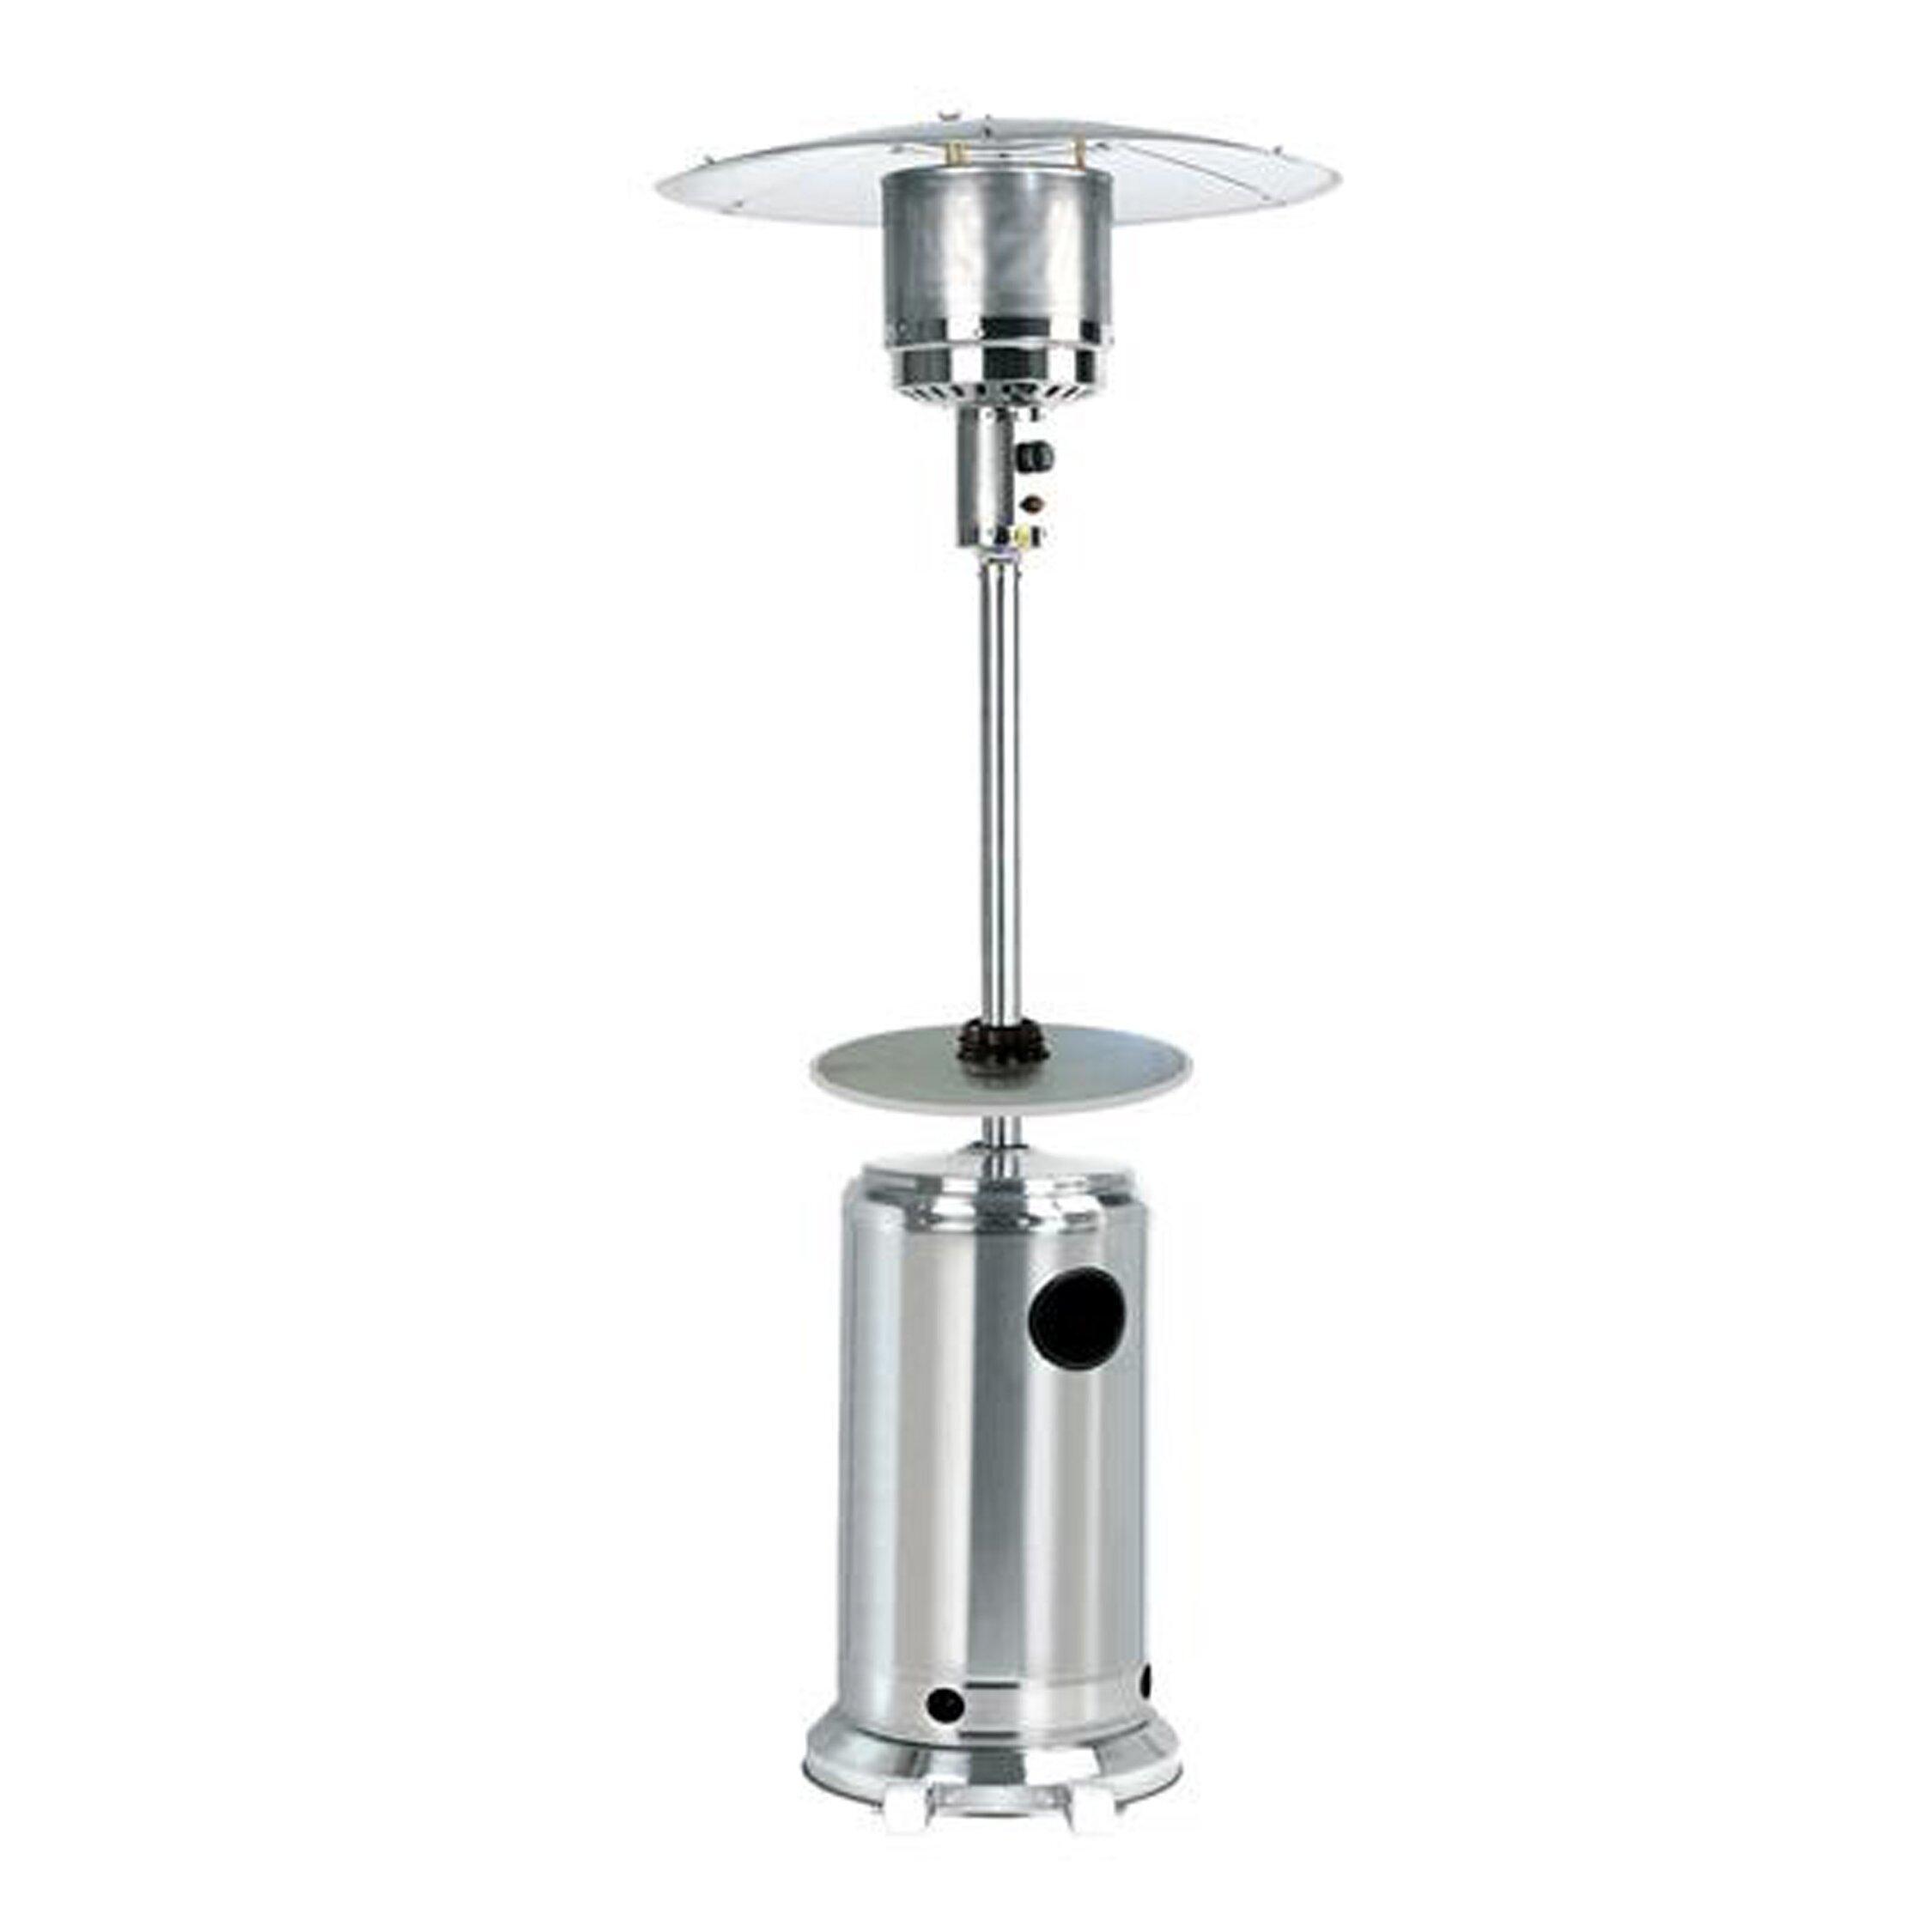 Az patio heaters tall propane patio heater with table - Garden treasures gas patio heater ...